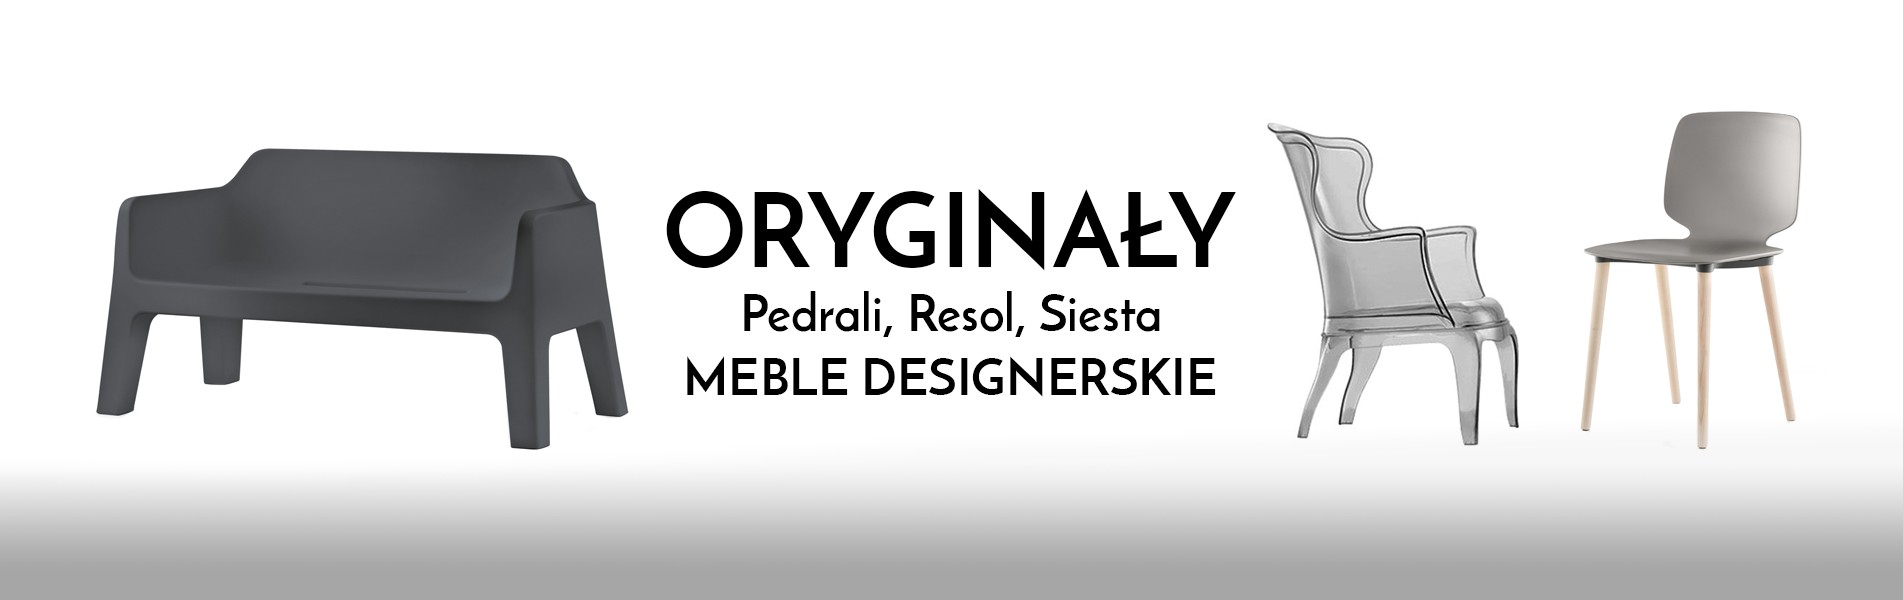 Oryginalne meble designerskie